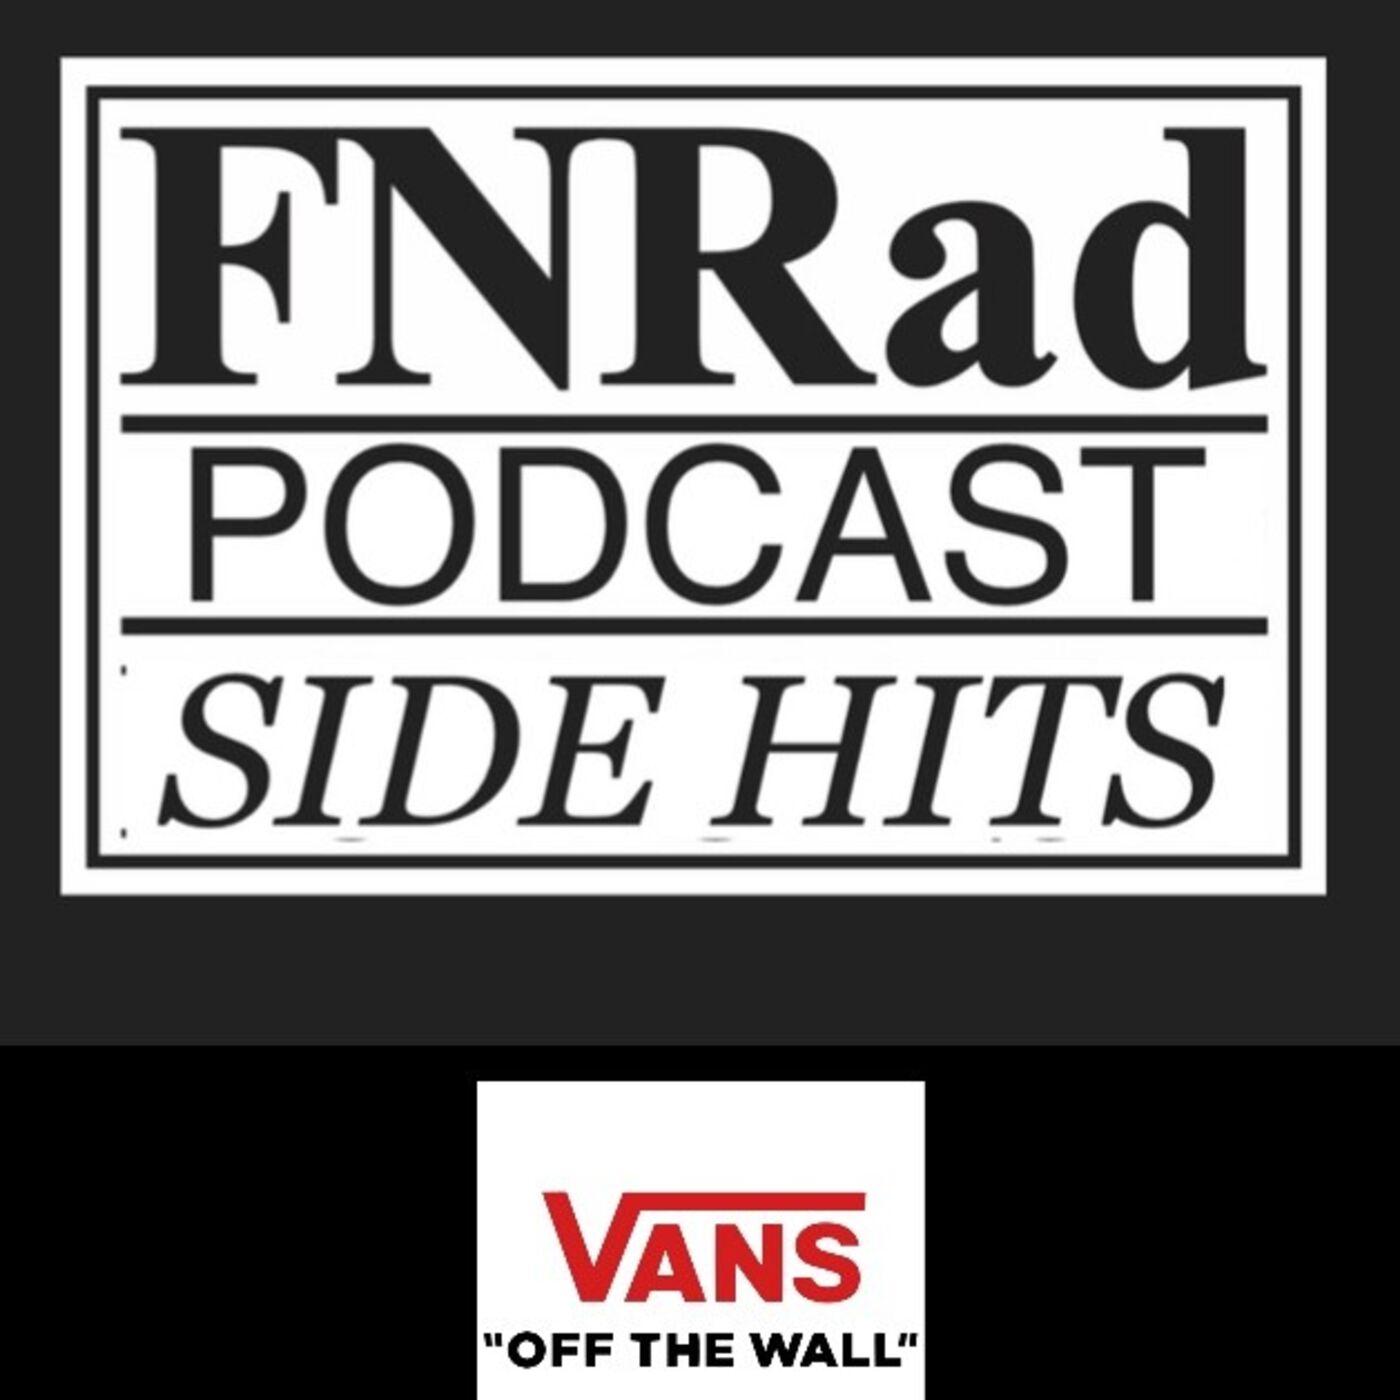 Side Hits Episode 2 Sean Kearns